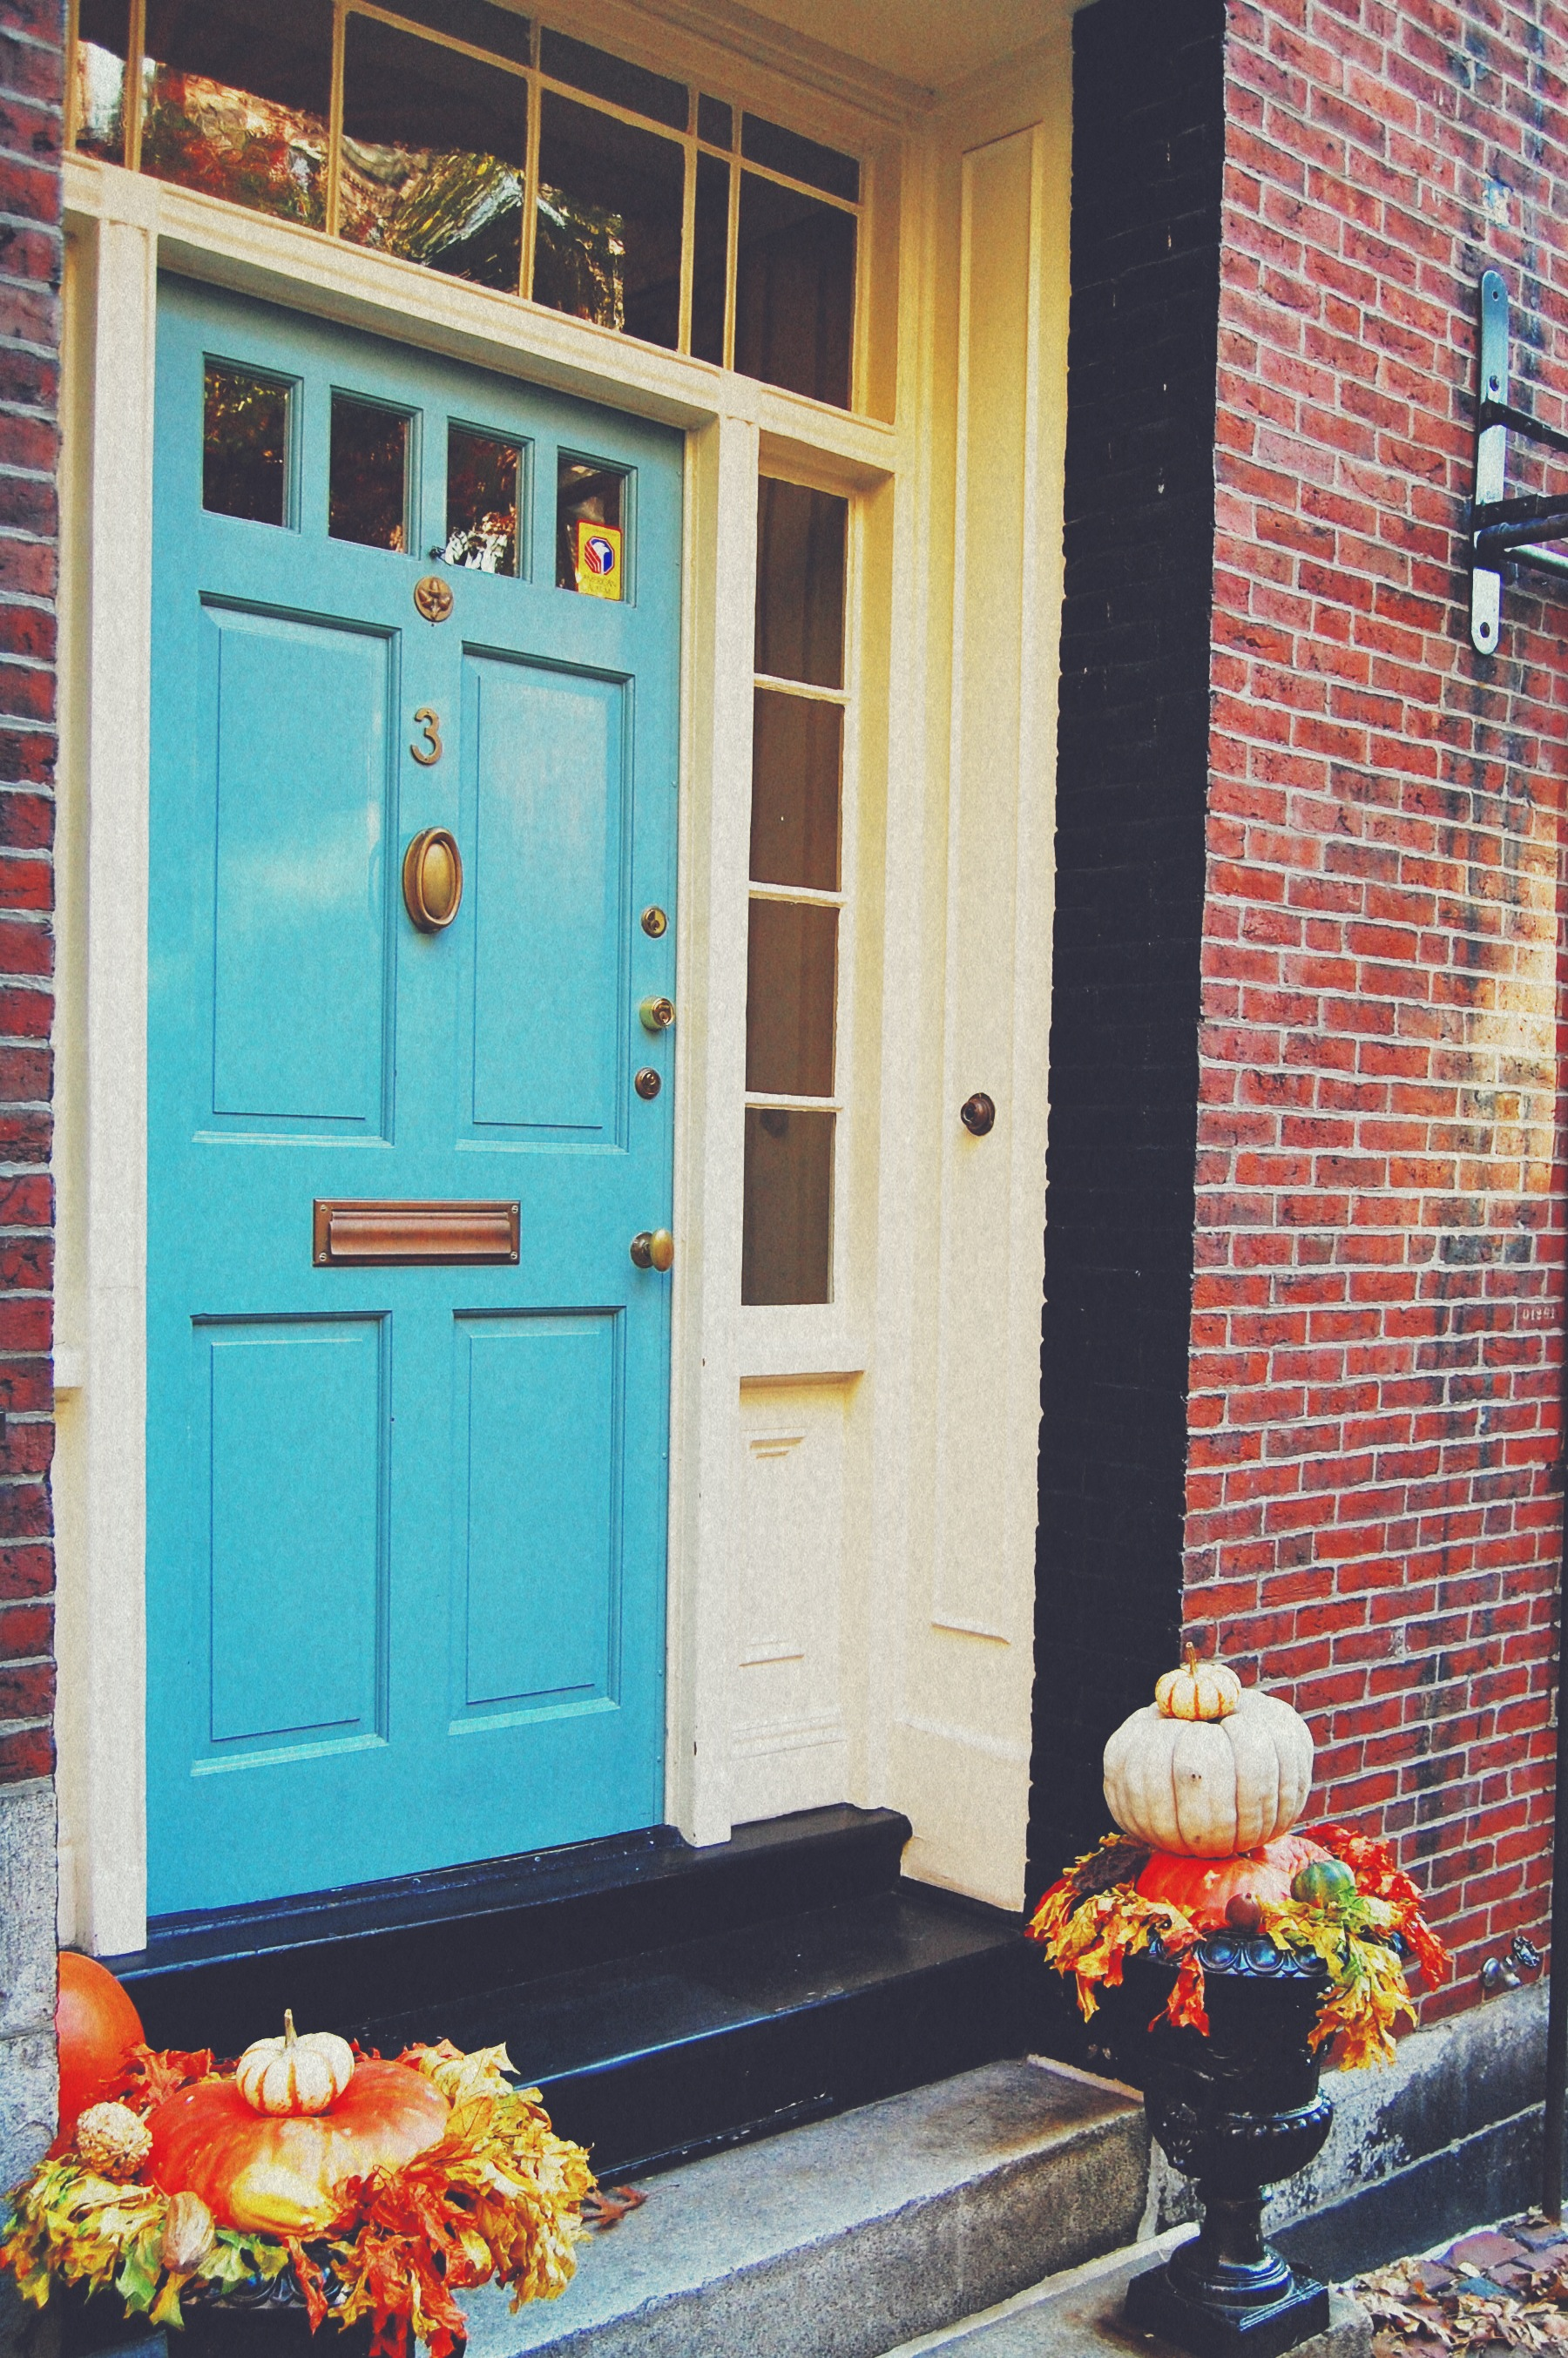 Acorn Street & Other Doors - shell chic'd